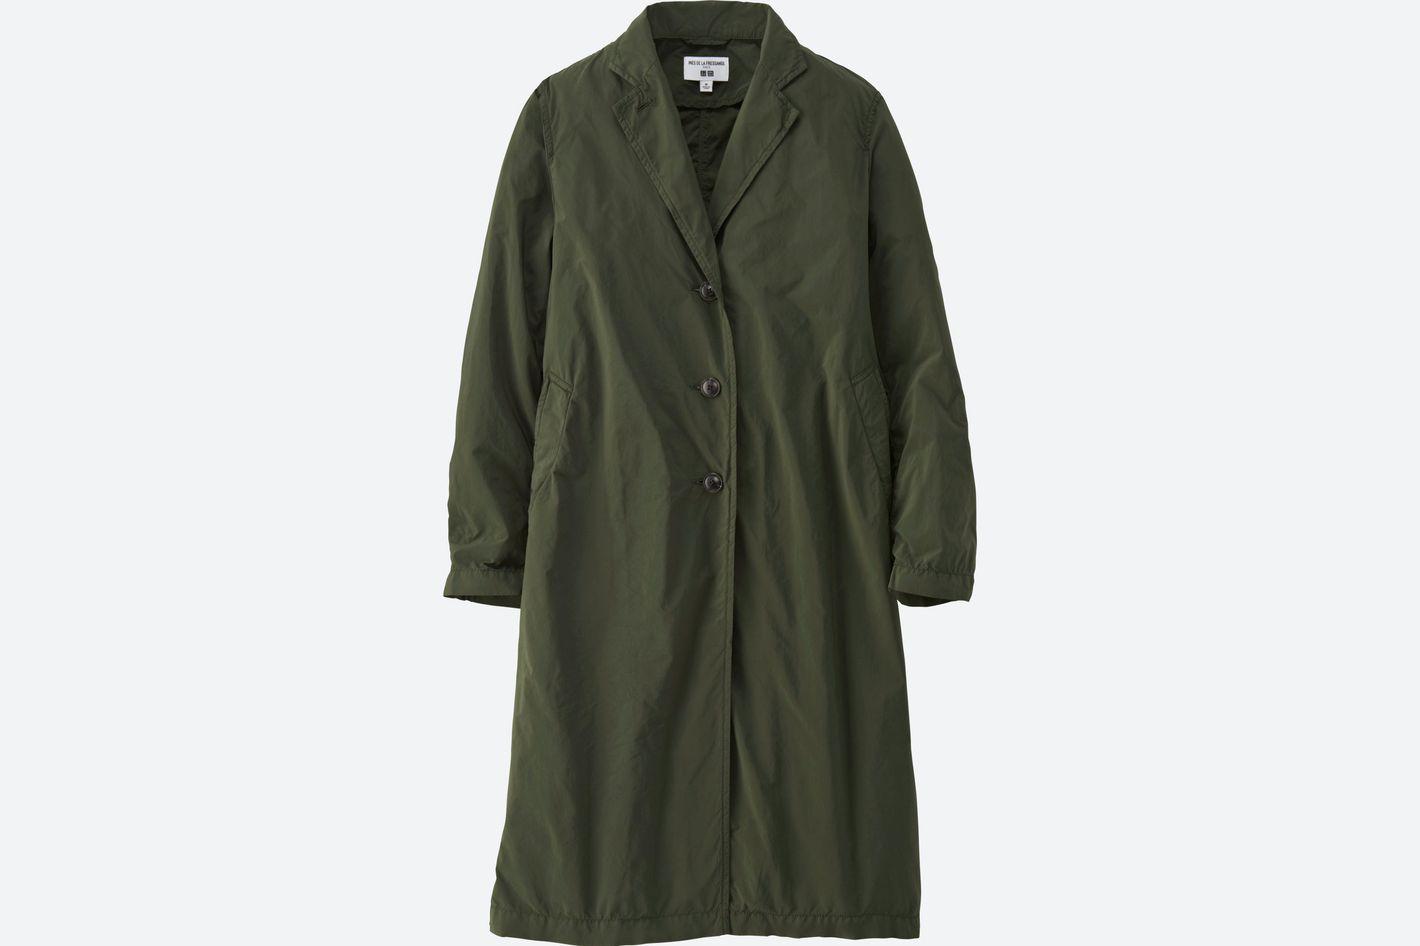 Women Duster Coat